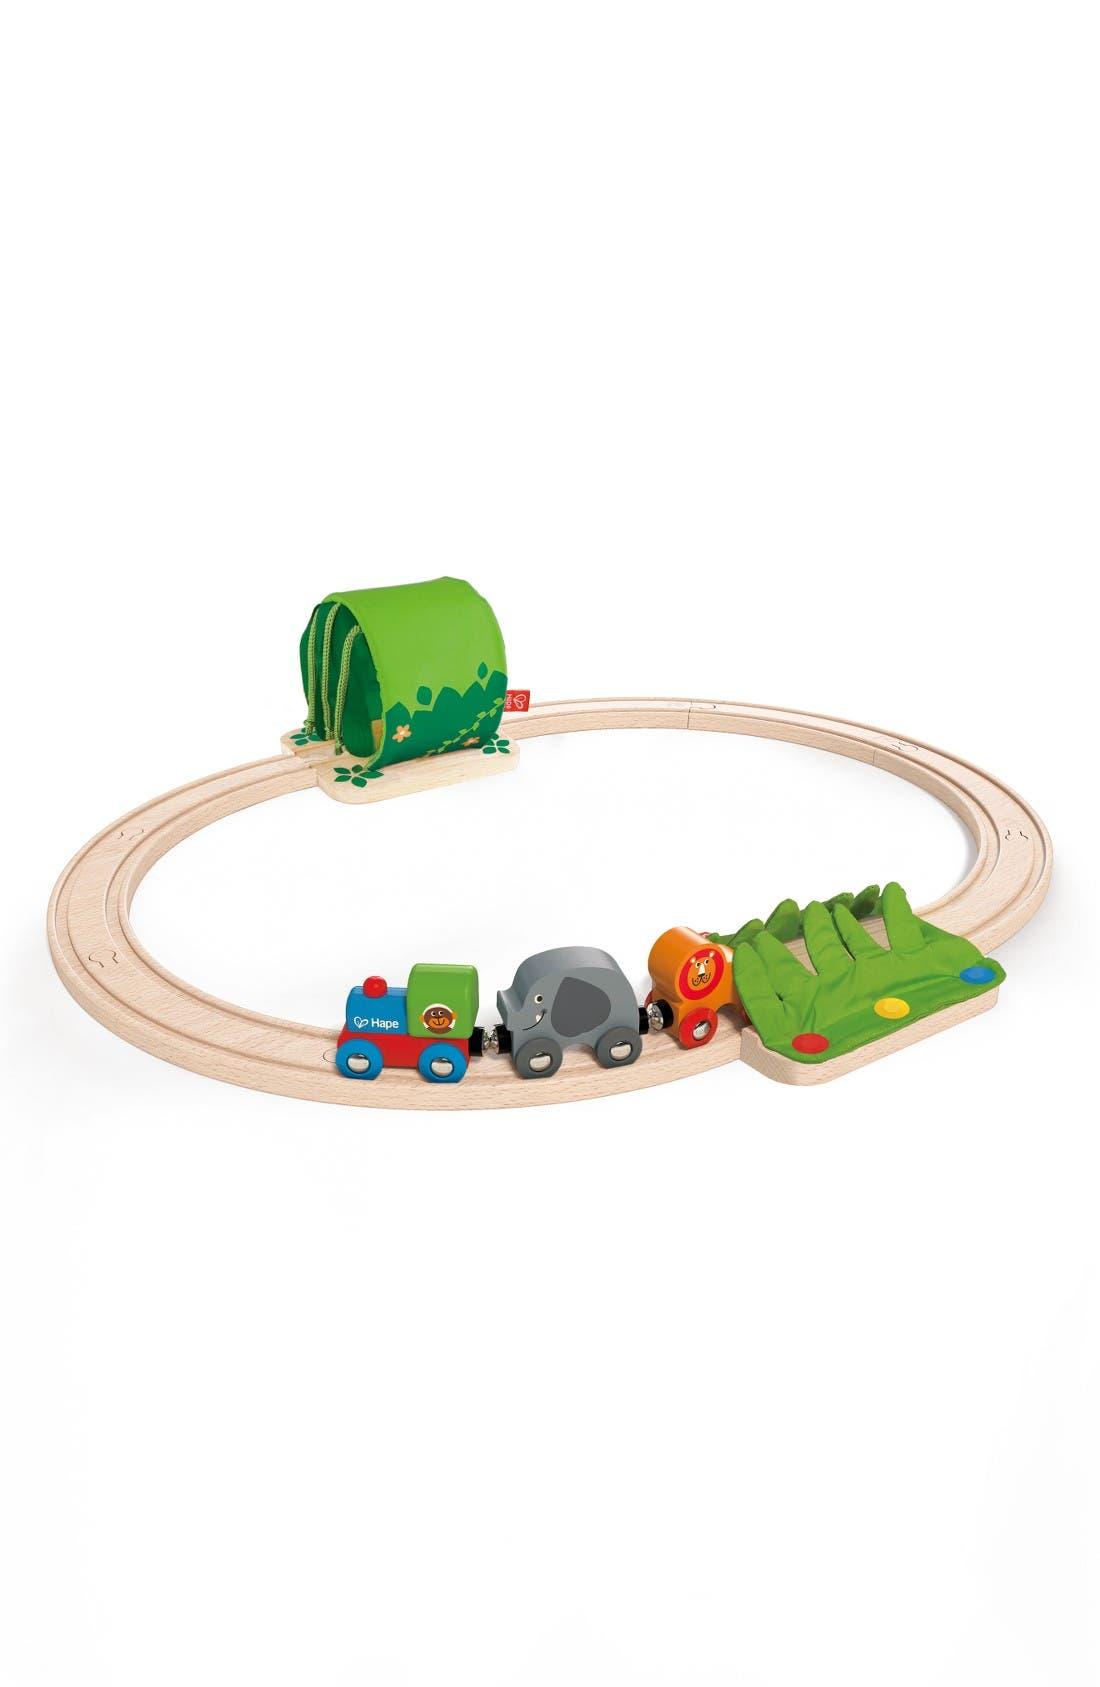 Hape Jungle Train Journey Wooden Train Set